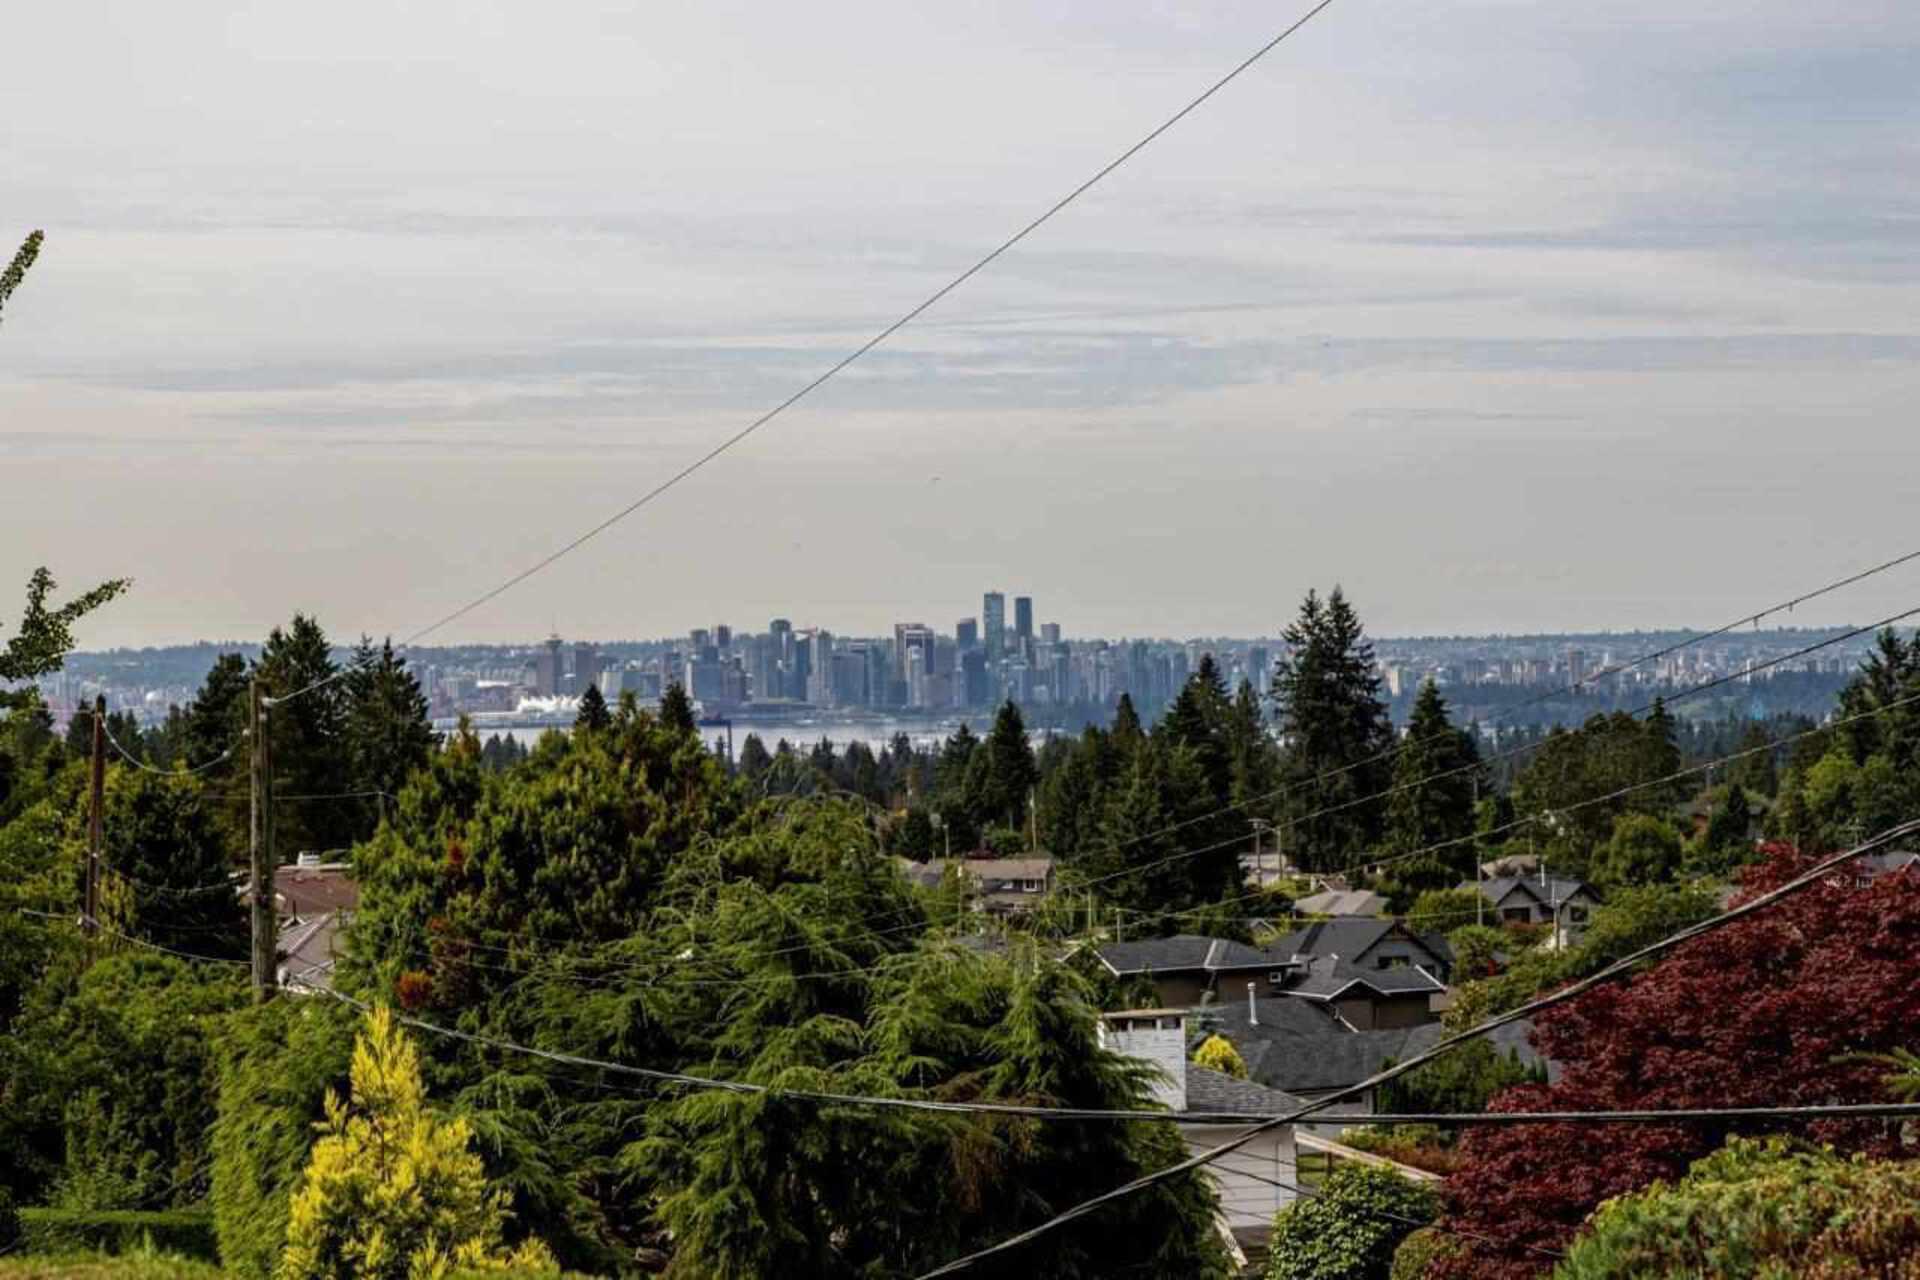 4367-ranger-avenue-forest-hills-nv-north-vancouver-34 at 4367 Ranger Avenue, Forest Hills NV, North Vancouver